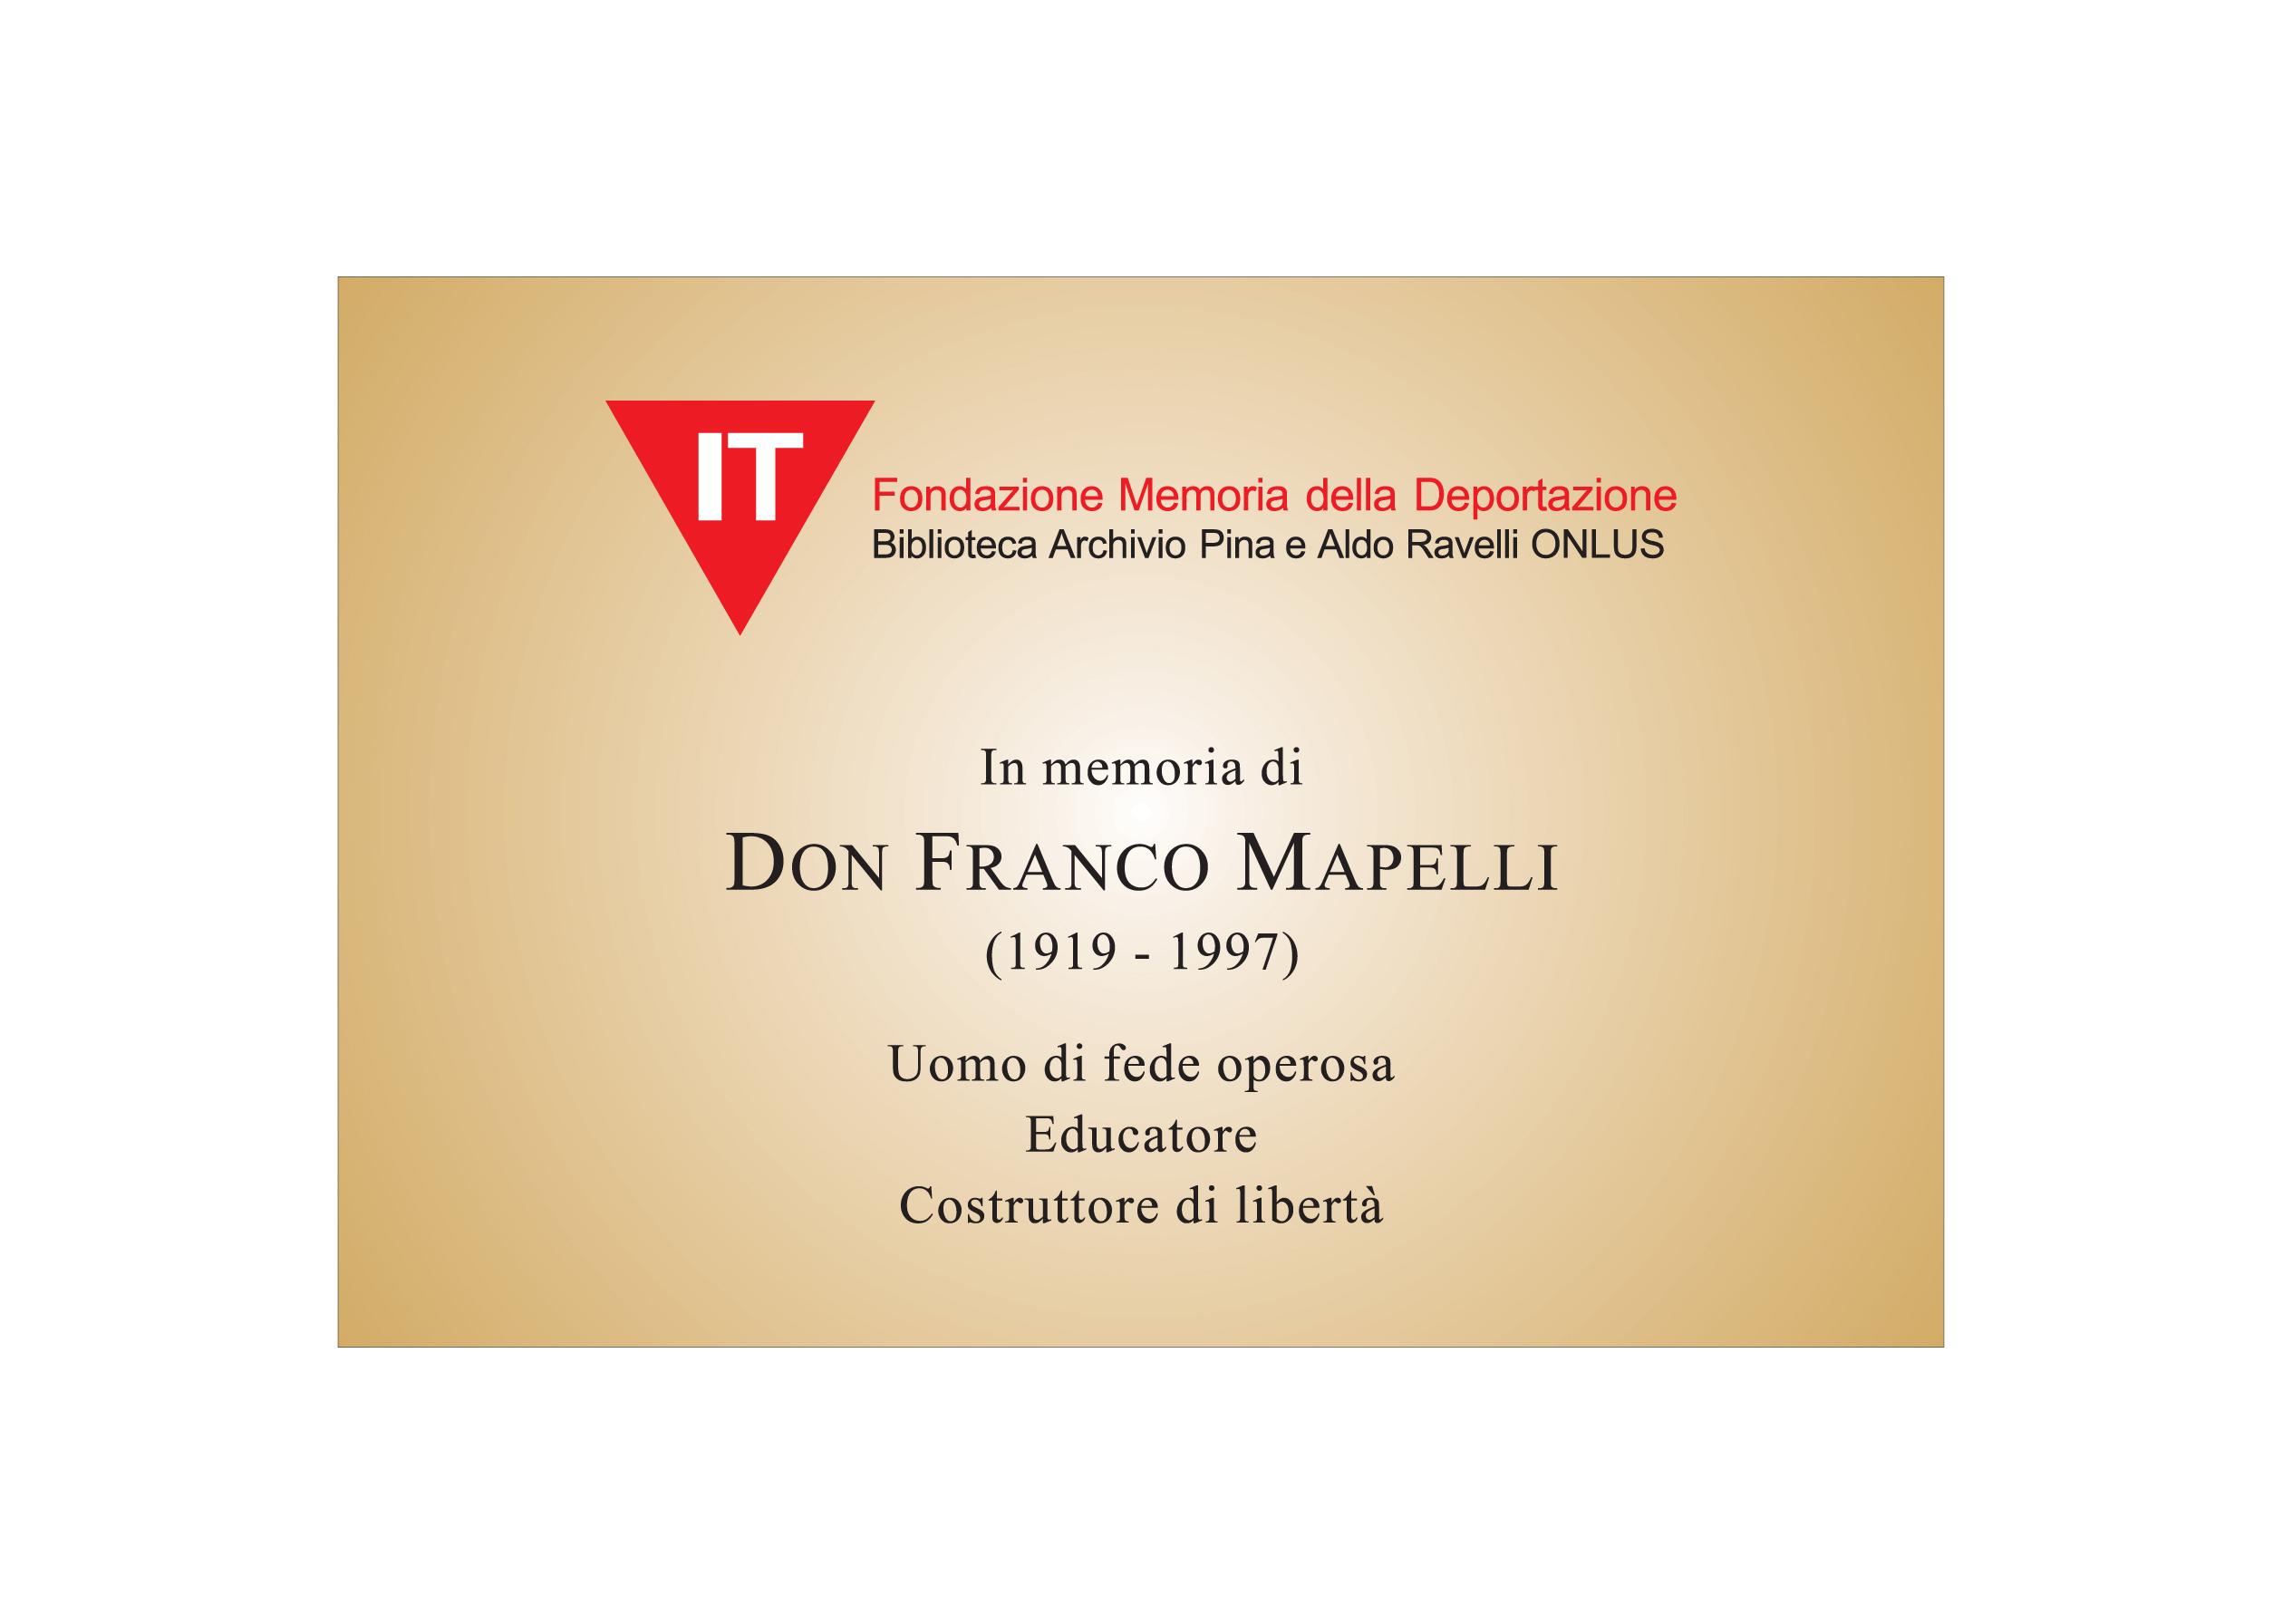 Targa Don Franco Mapelli copy